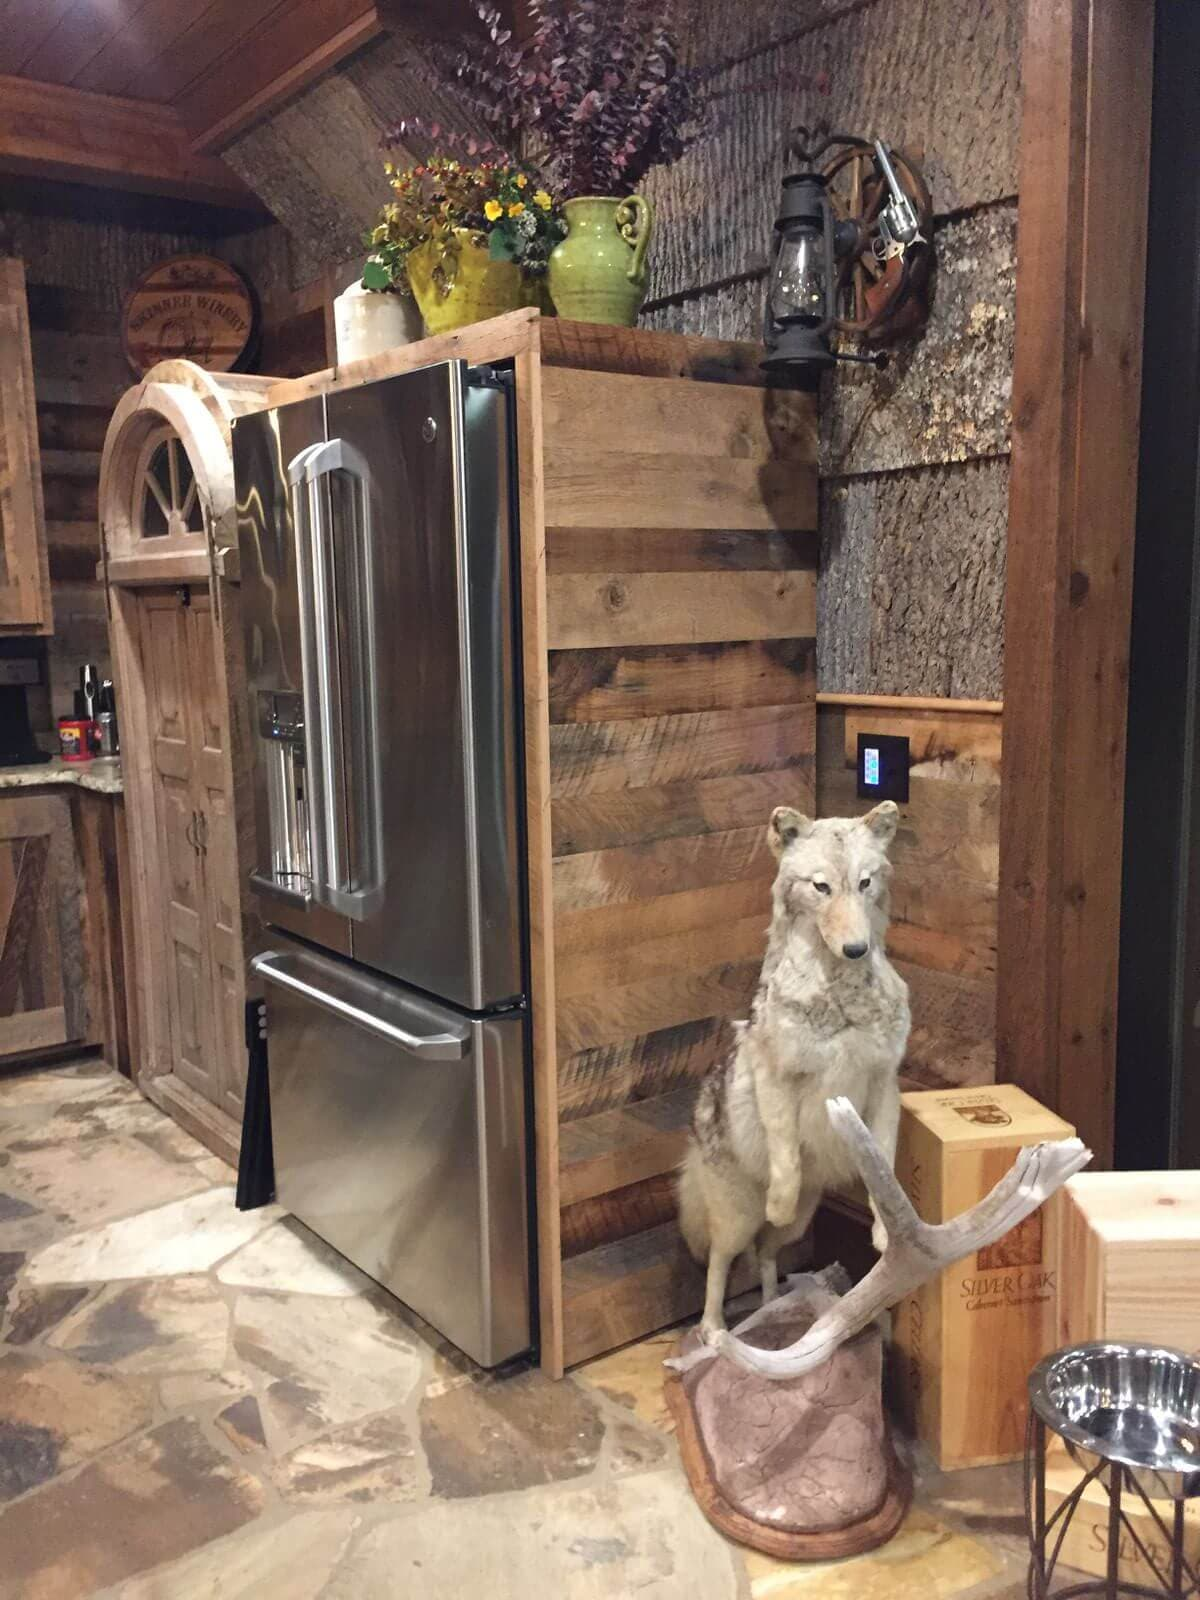 Reclaimed wood framing a refrigerator at mountain air rv resort